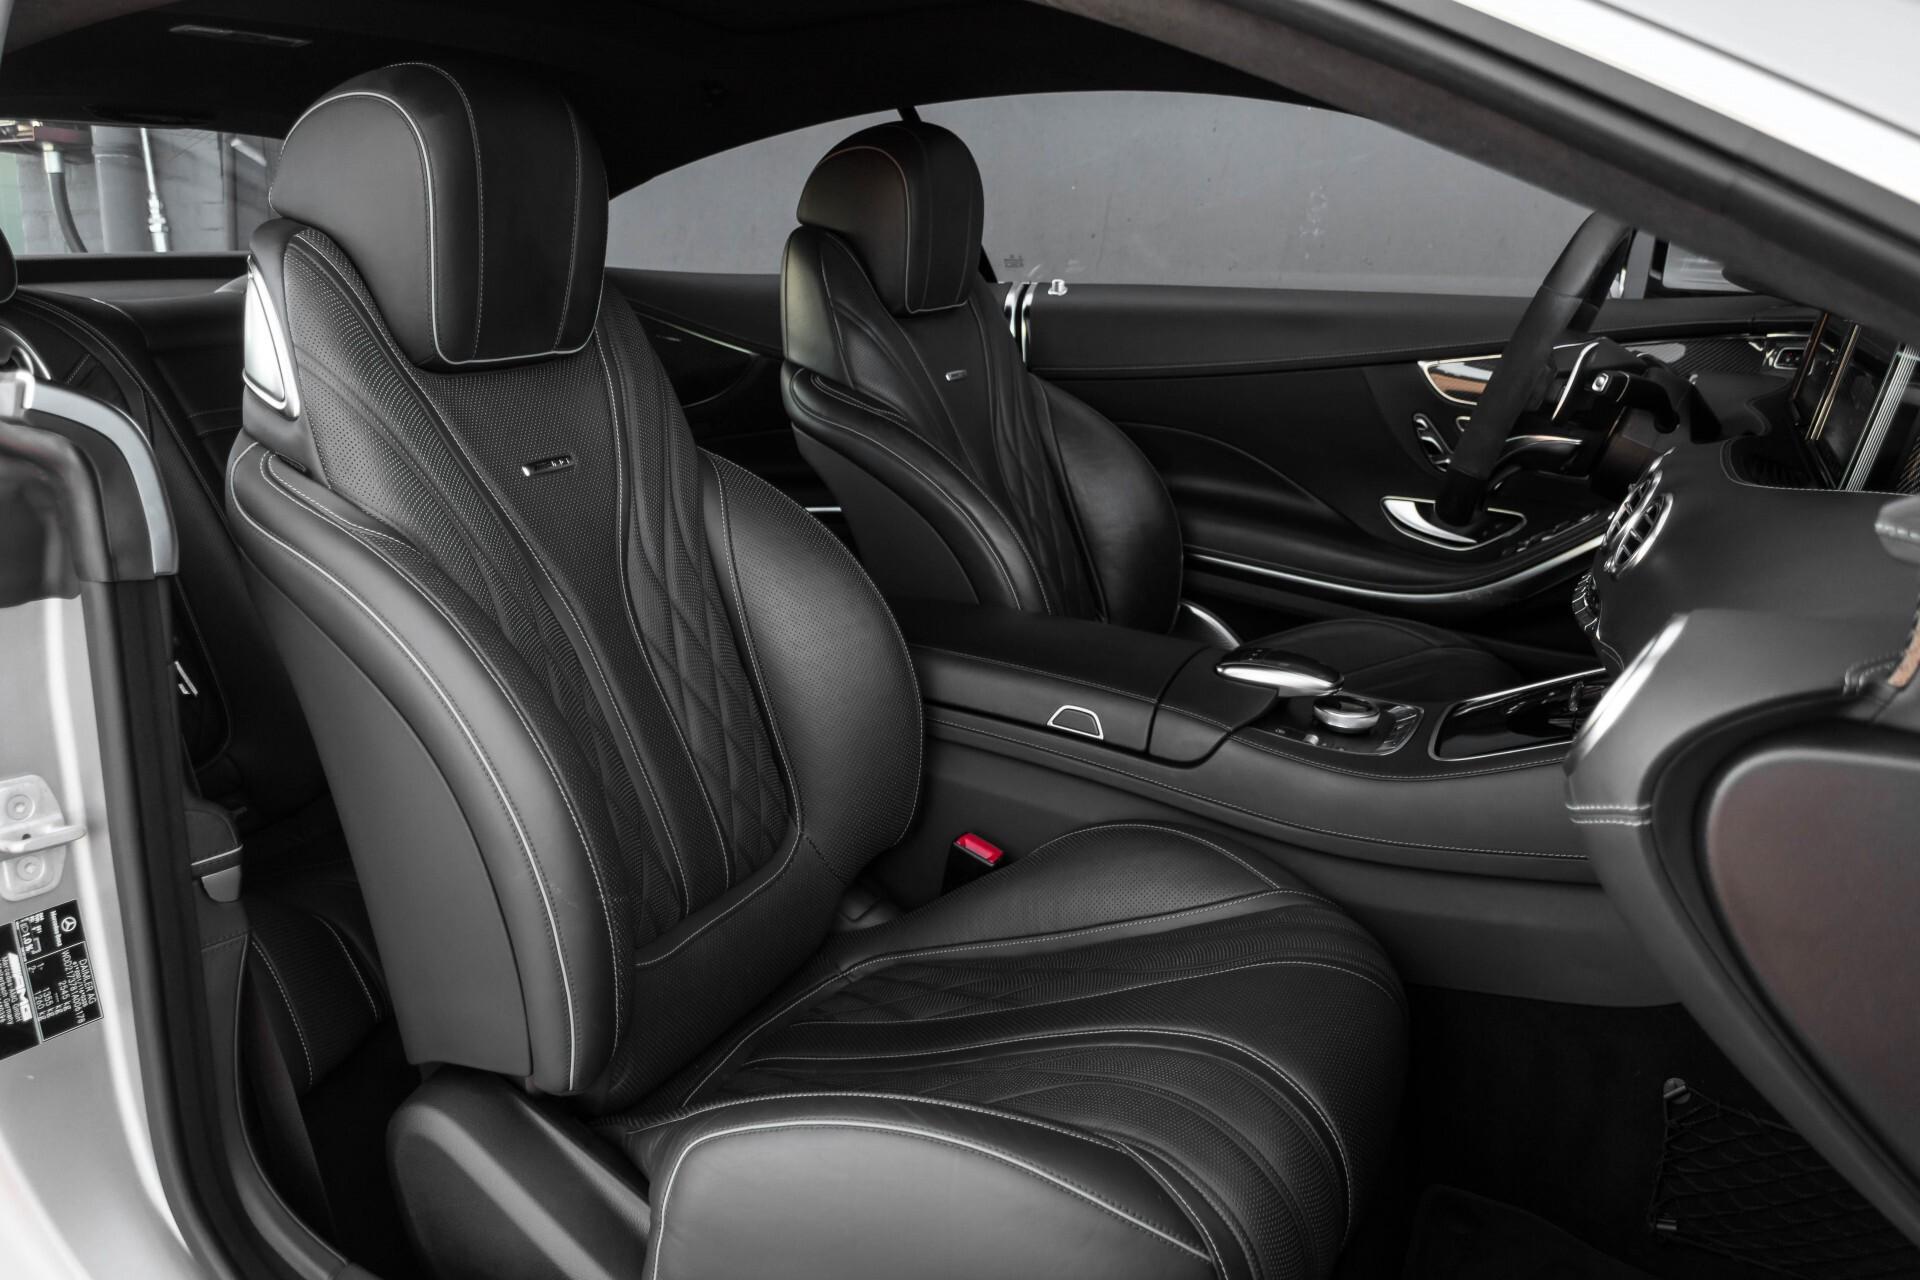 Mercedes-Benz S-Klasse Coupé 63 AMG 4-M Ceramic/Akrapovic/Swarowski/Designo/Burmester High End Aut7 Foto 3